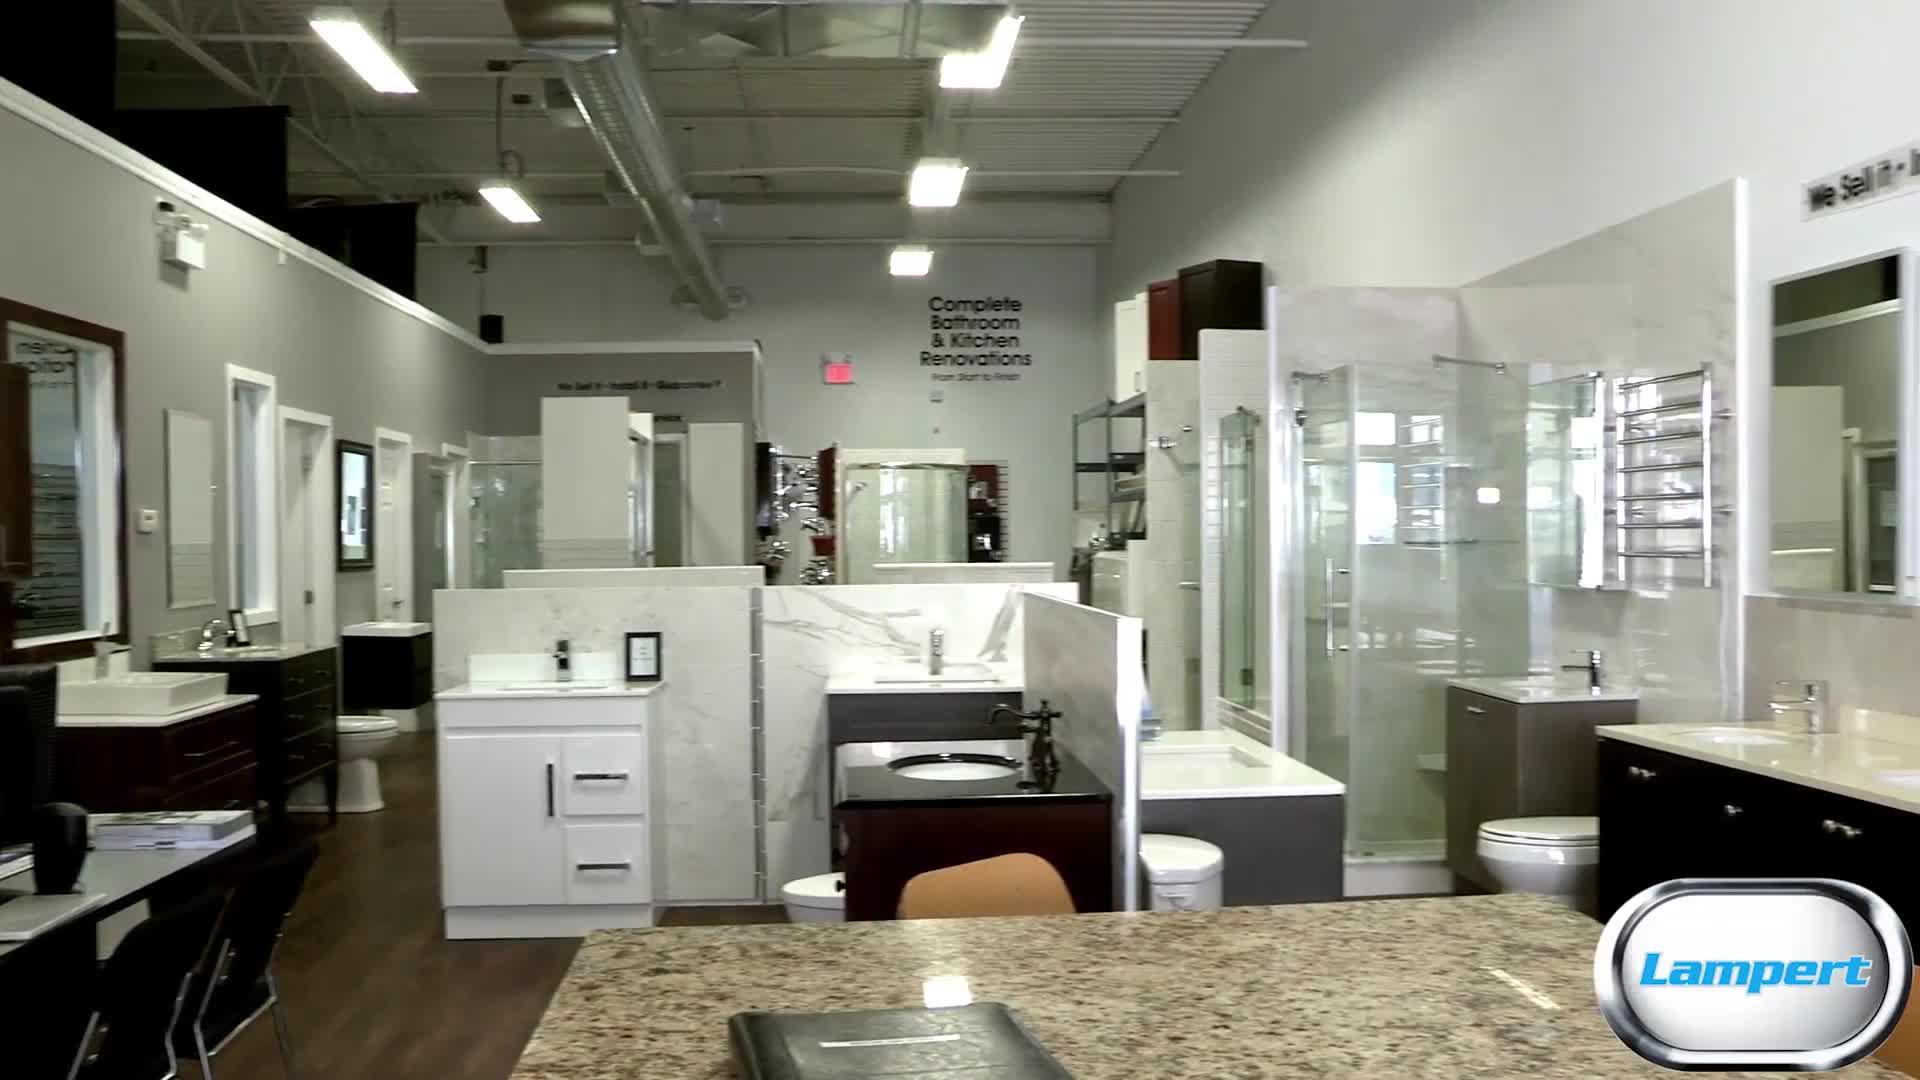 video Lampert Plumbing